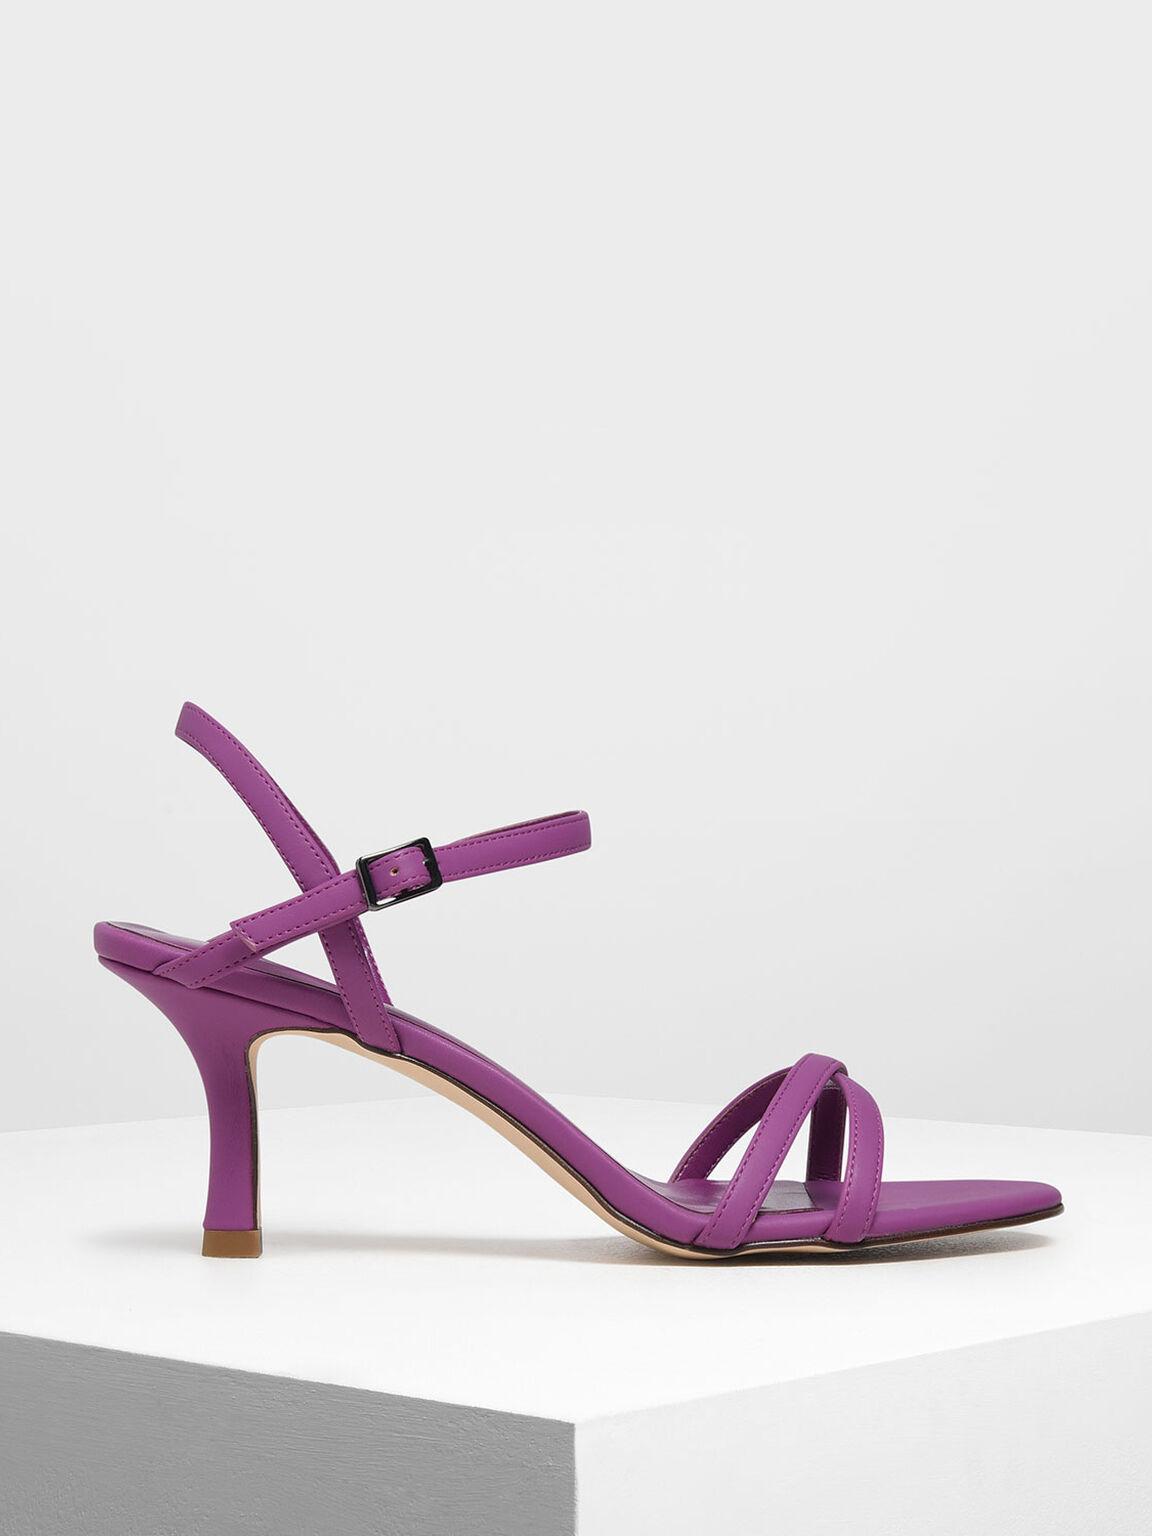 Criss Cross Blade Heel Sandals, Fuchsia, hi-res